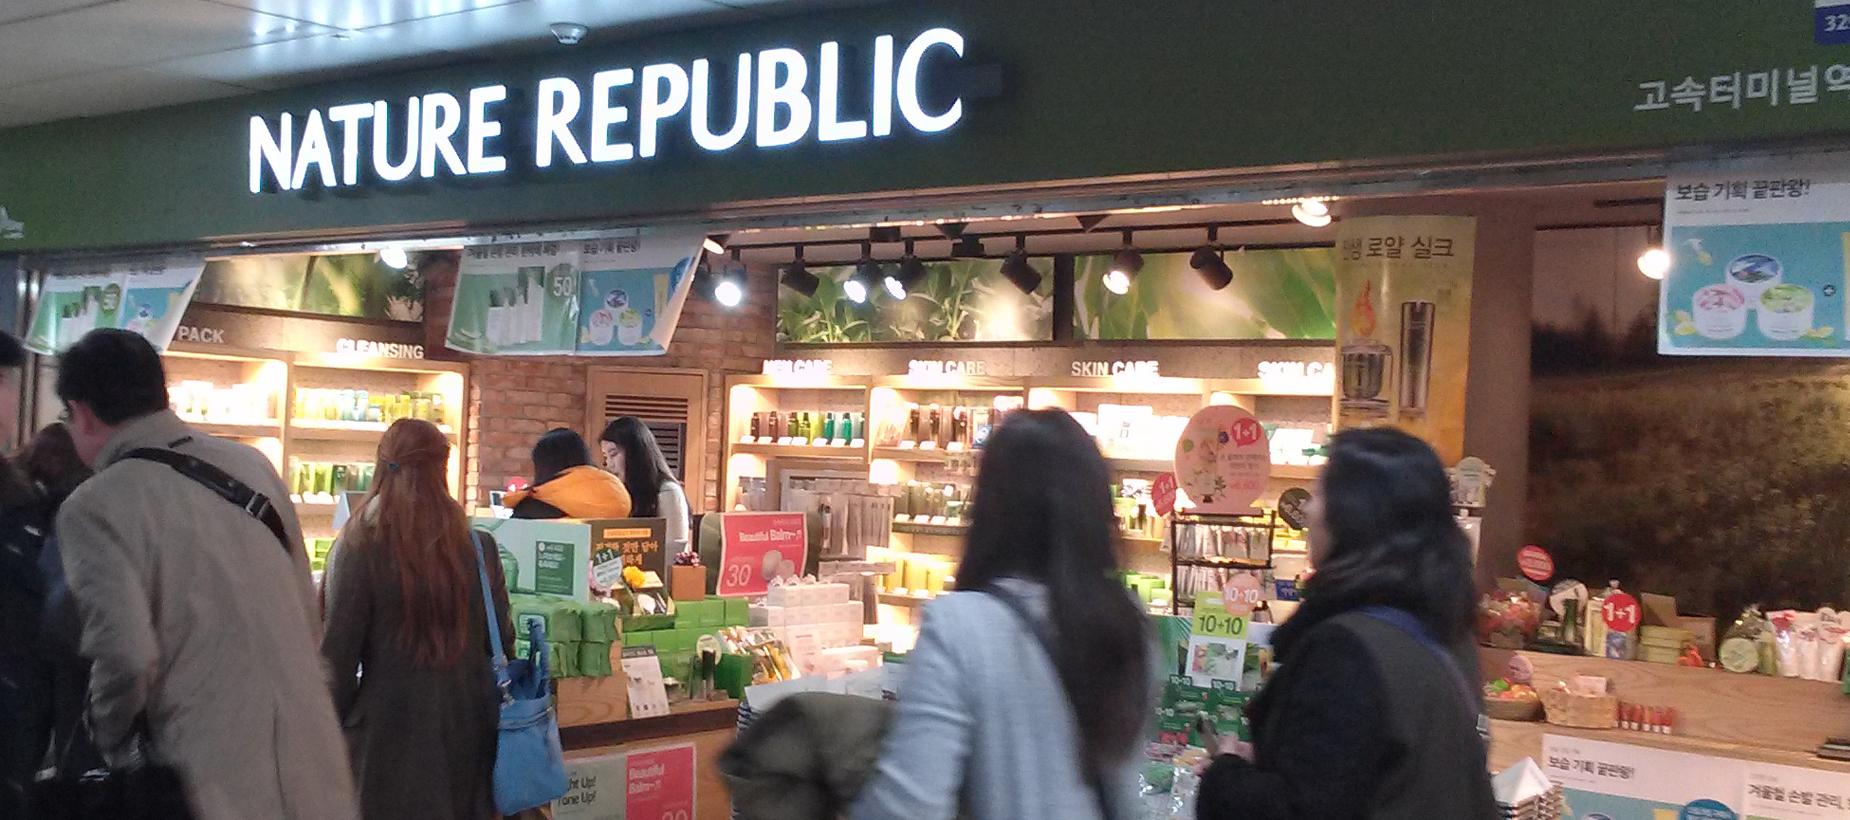 nature-republic.jpg